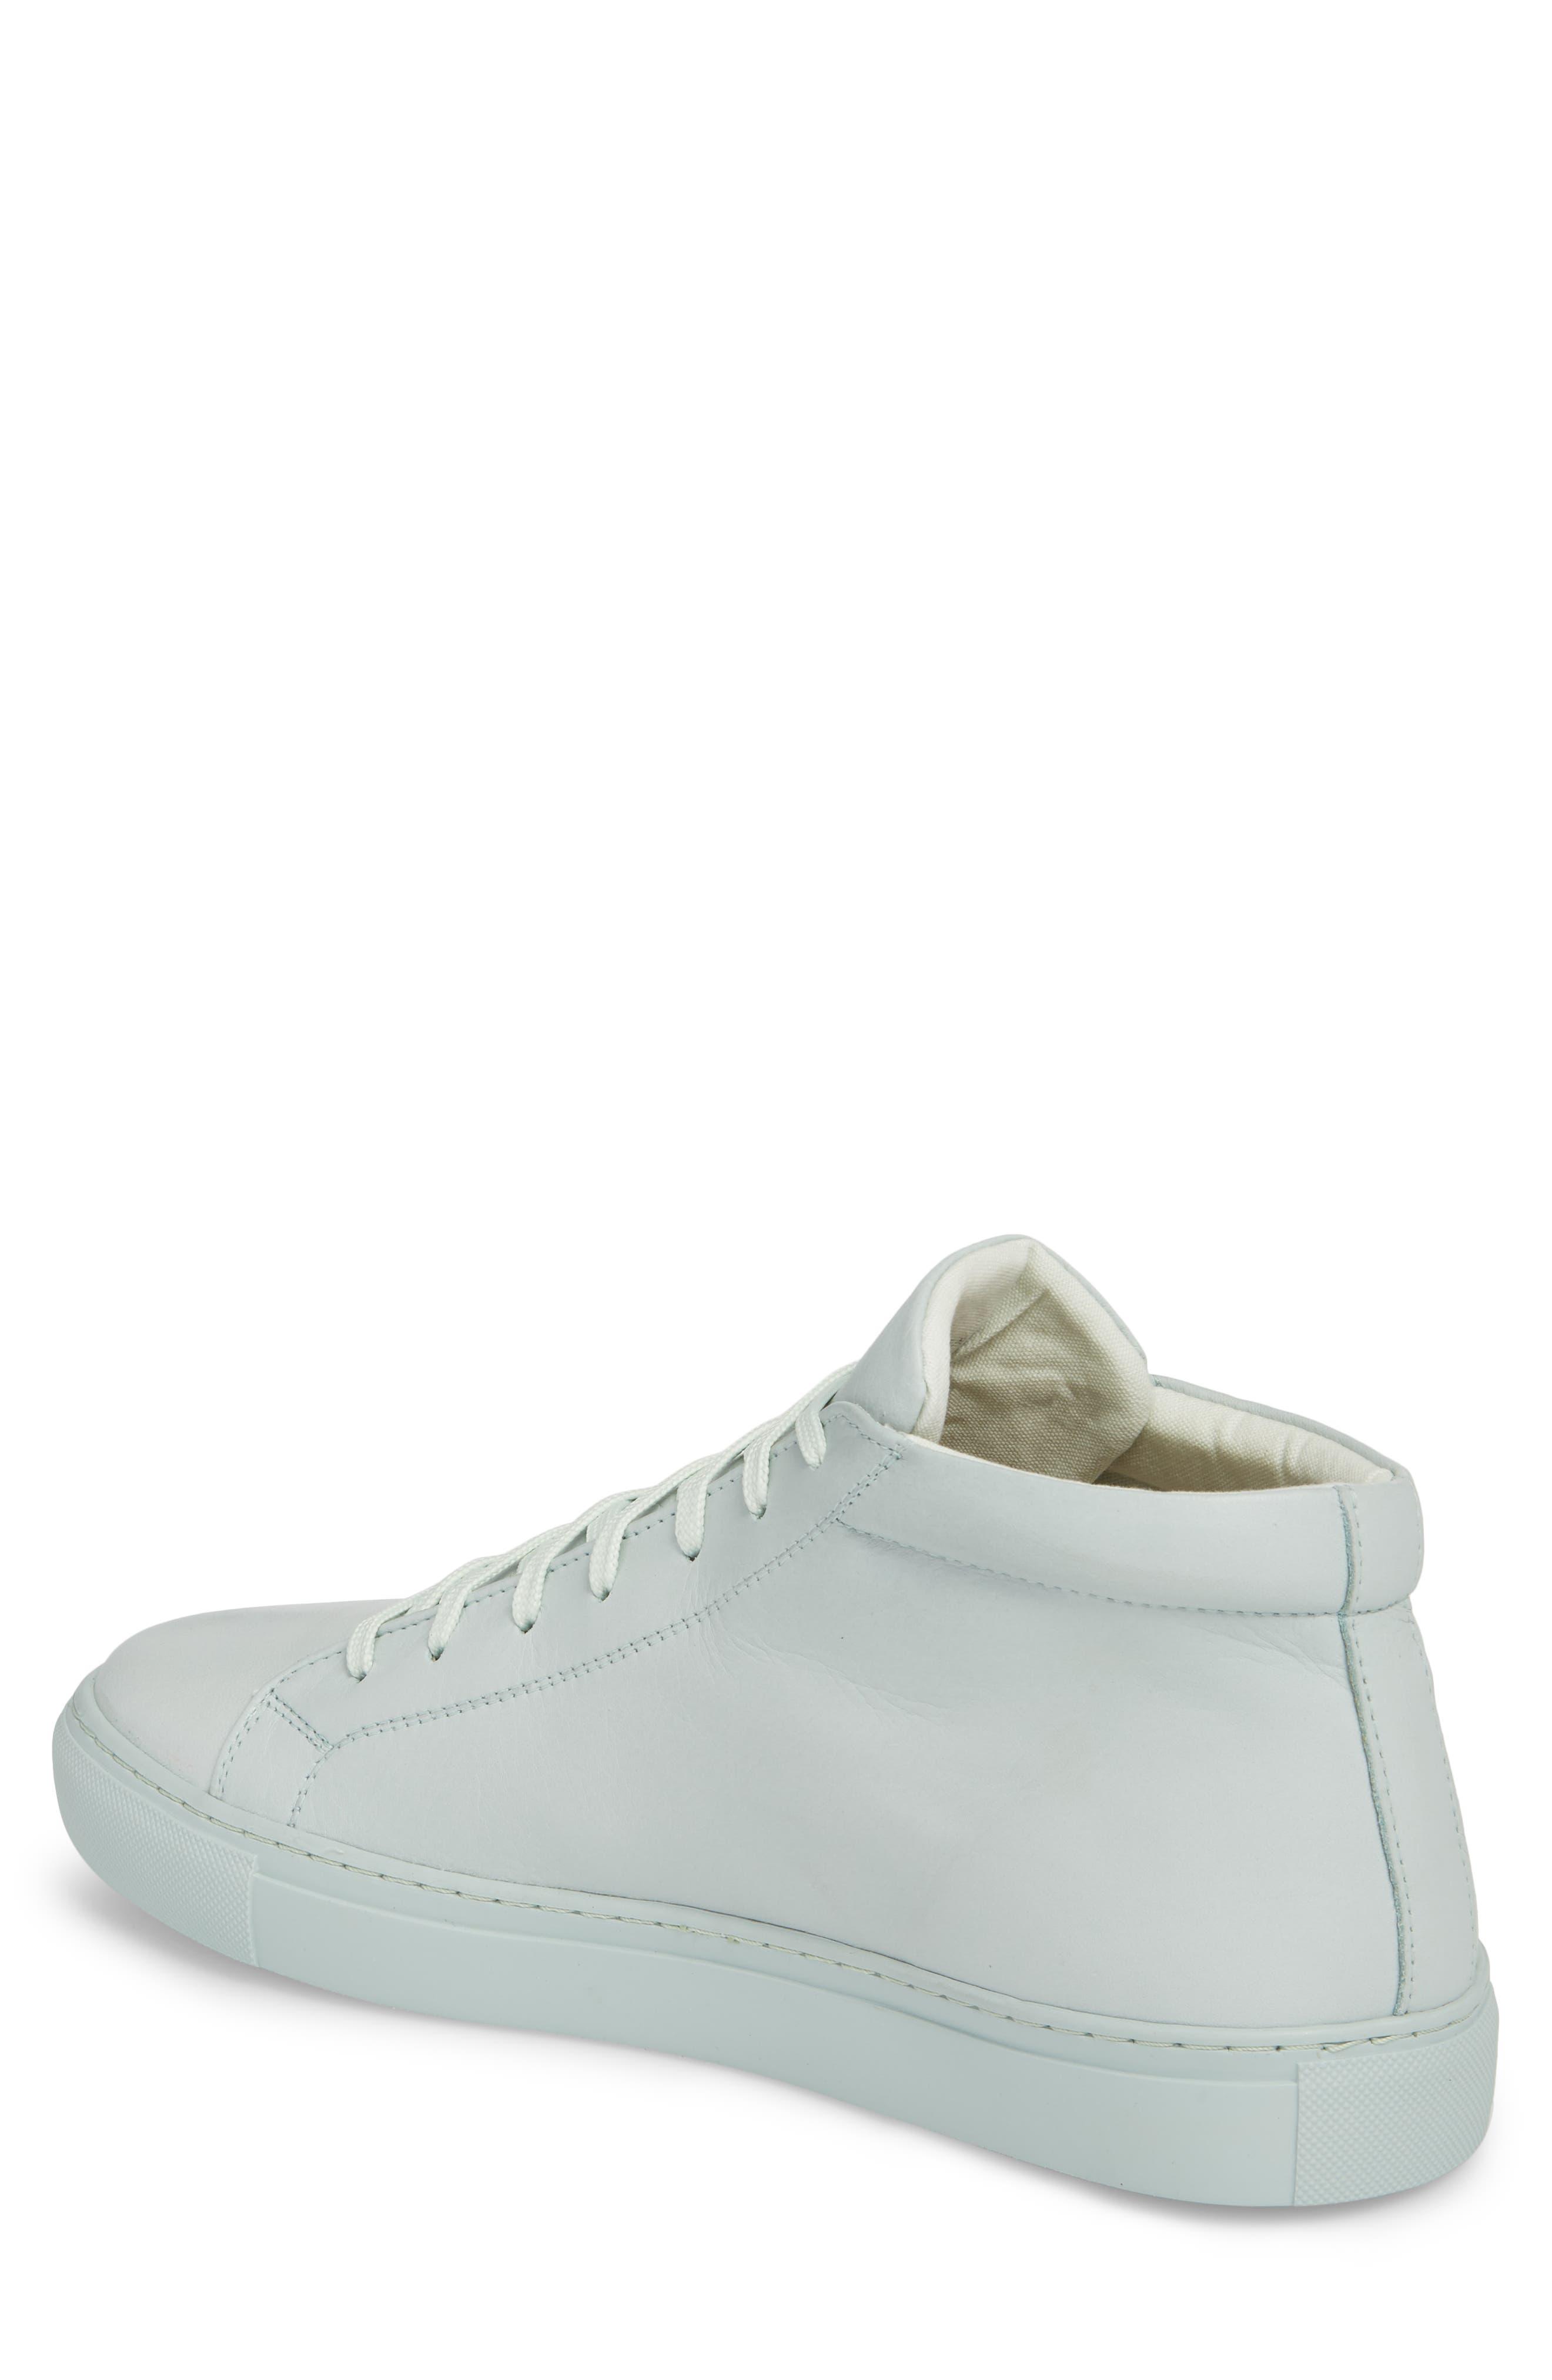 Lexington Mid Top Sneaker,                             Alternate thumbnail 4, color,